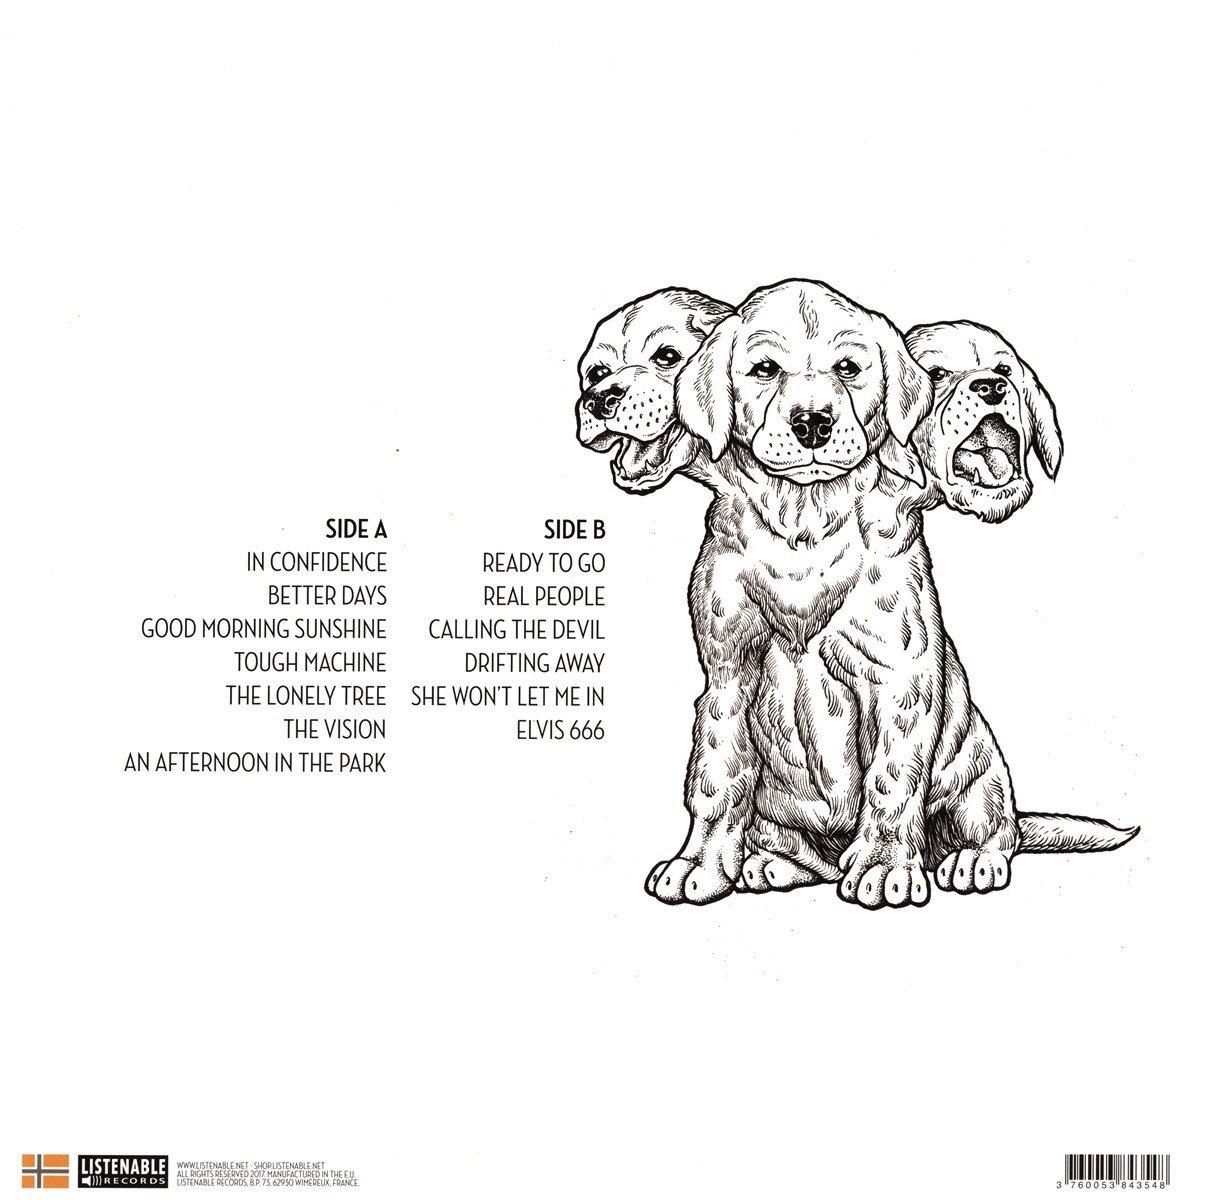 STICKY BOYS - Calling The Devil - Amazon.com Music